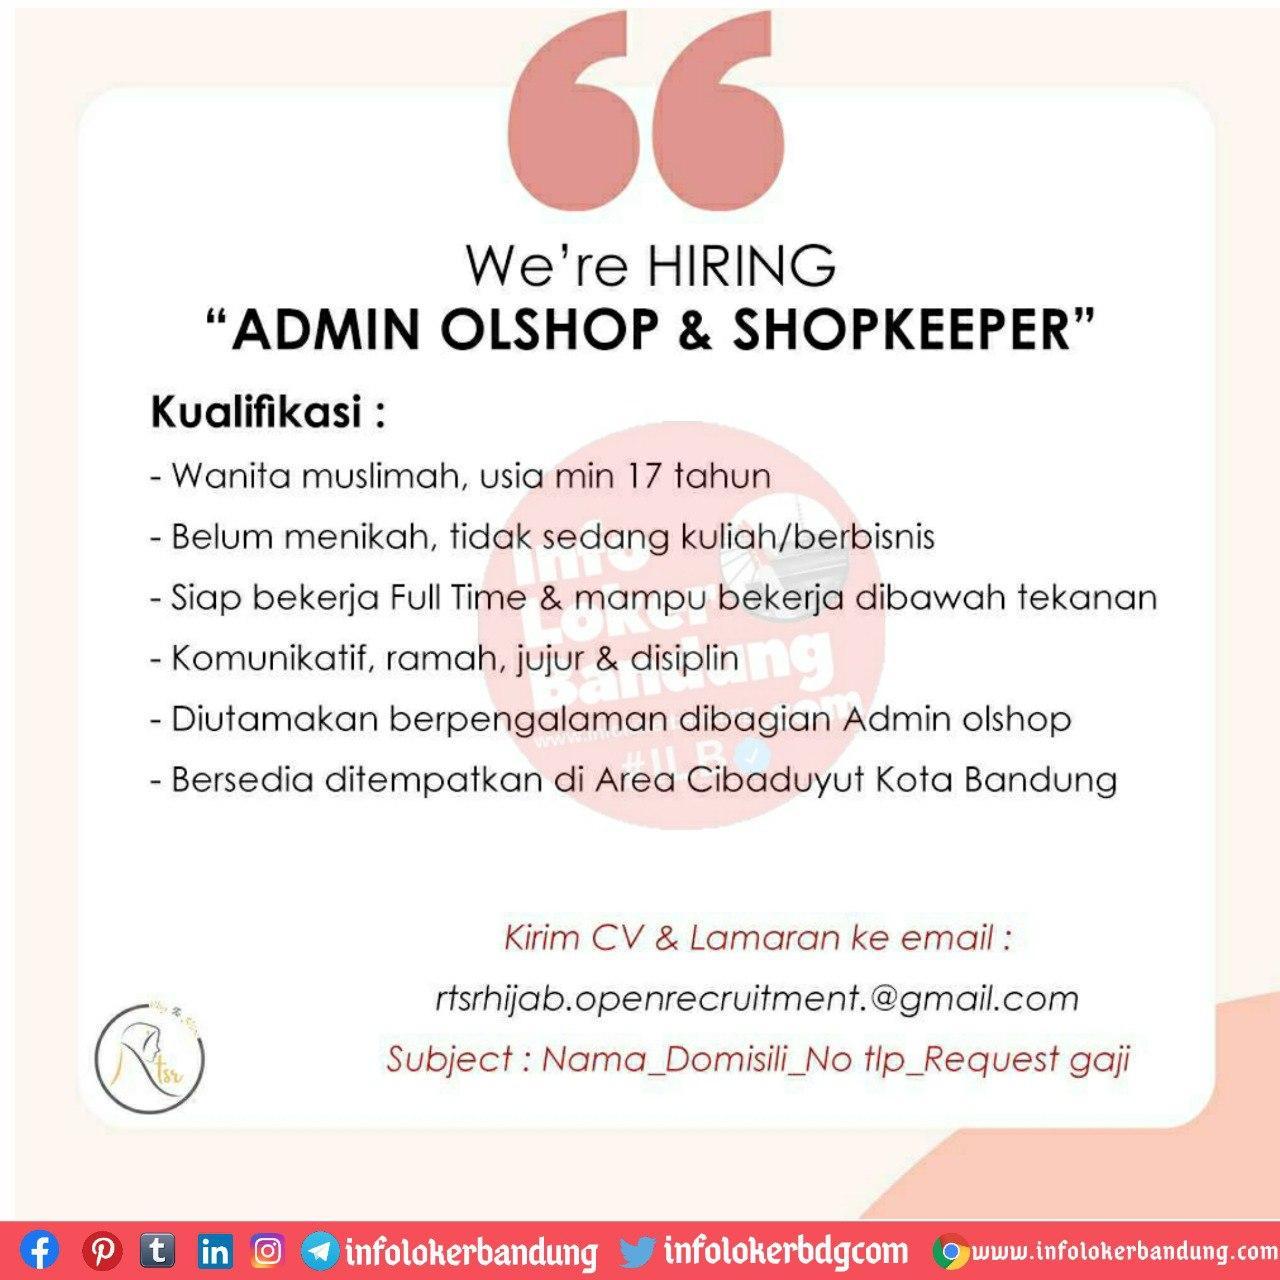 Lowongan Kerja Admin Olshop & Shopkeeper RTS Hijab Bandung Agustus 2020